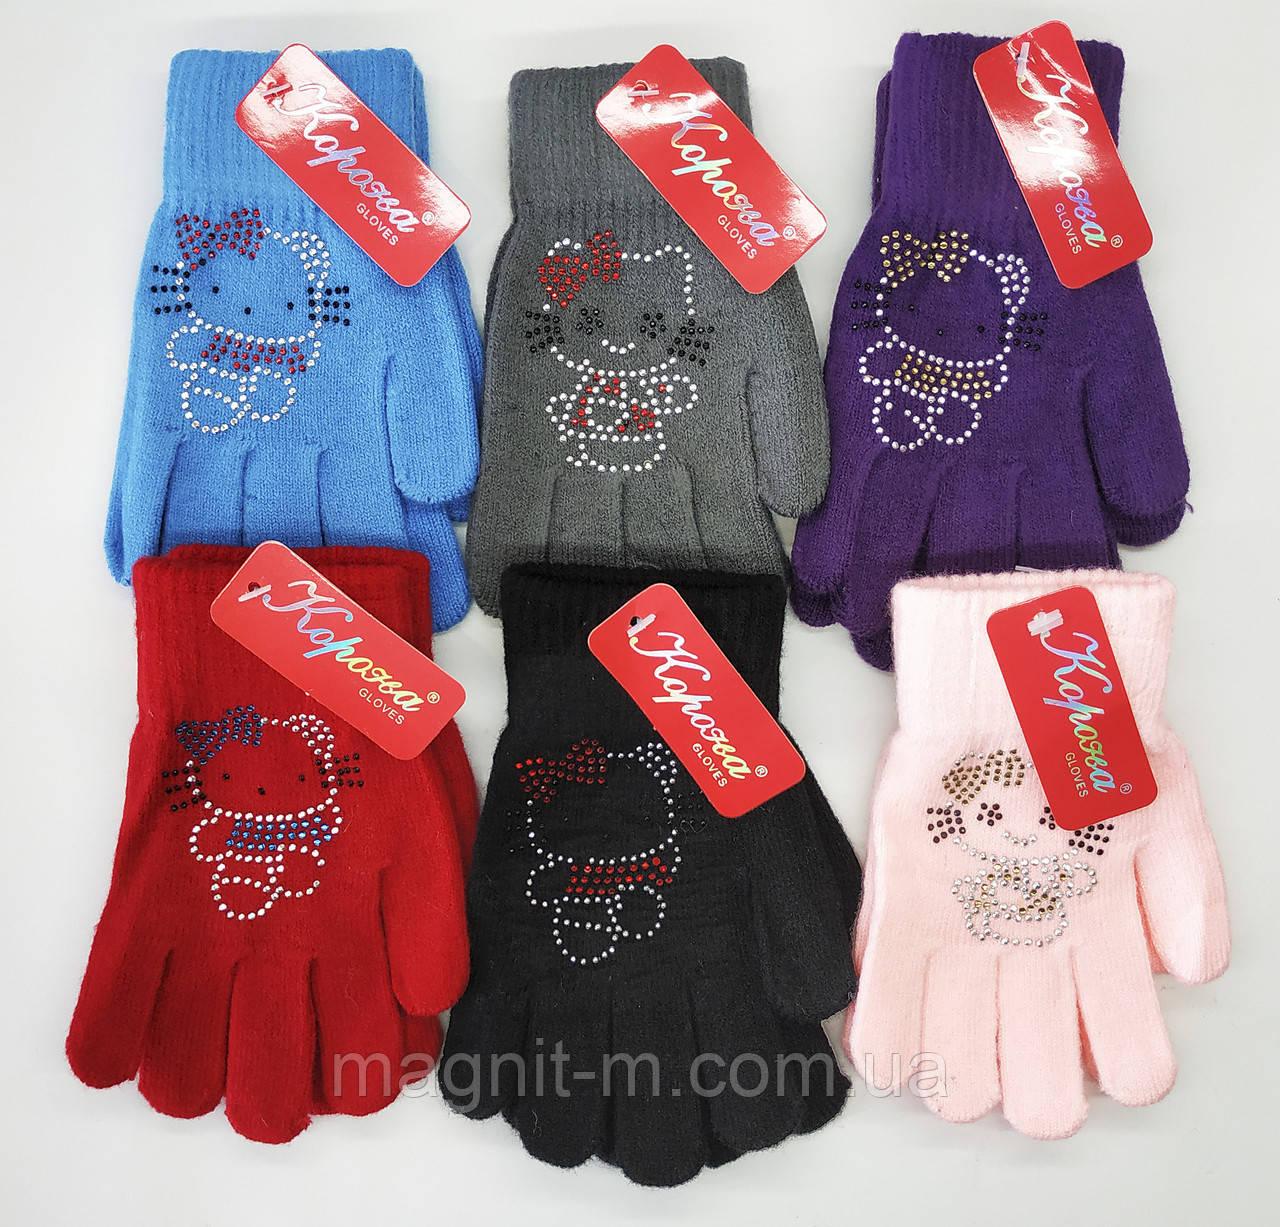 "Перчатки детские ""Корона"". Hello Kitty из страз. Размер М (5-7 лет). E5663."